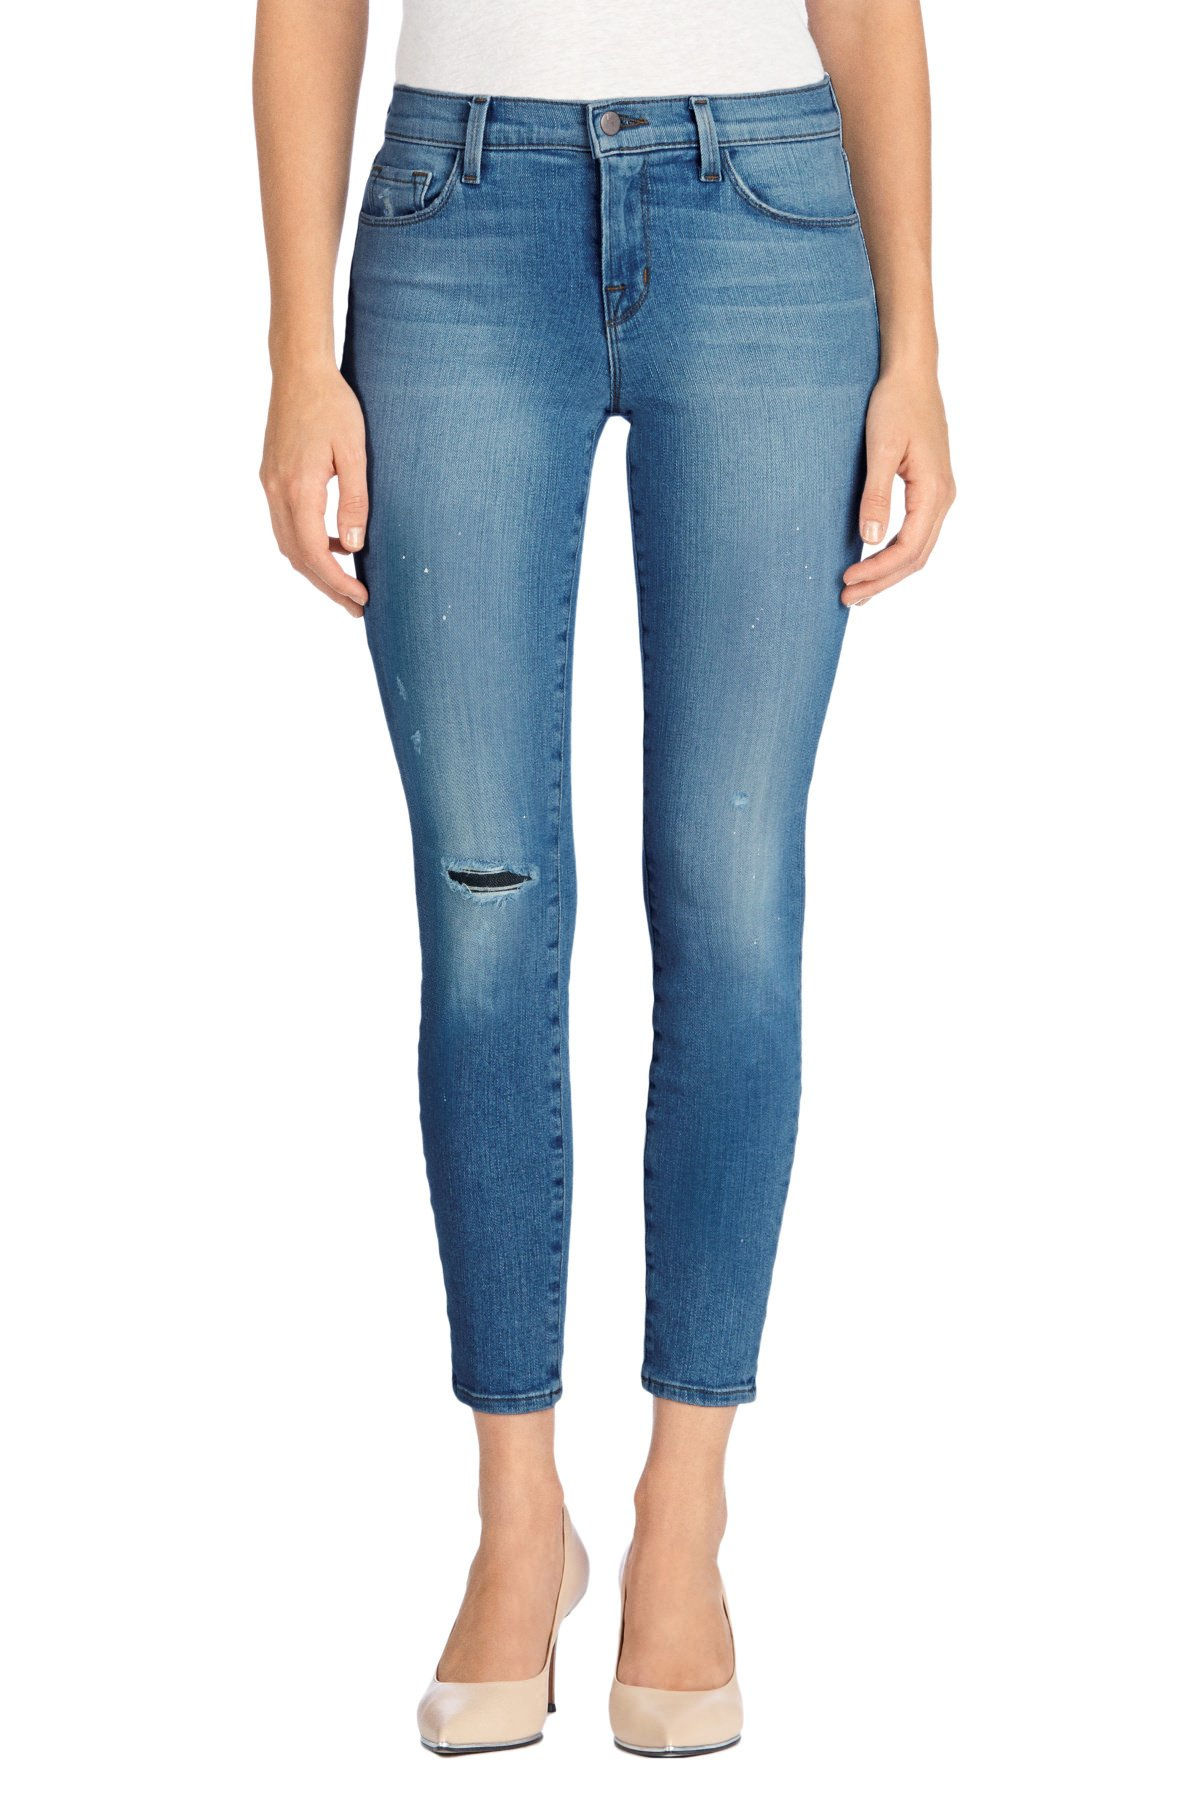 J Brand Womens Denim Distressed Capri Jeans Blue 25 by J Brand Jeans